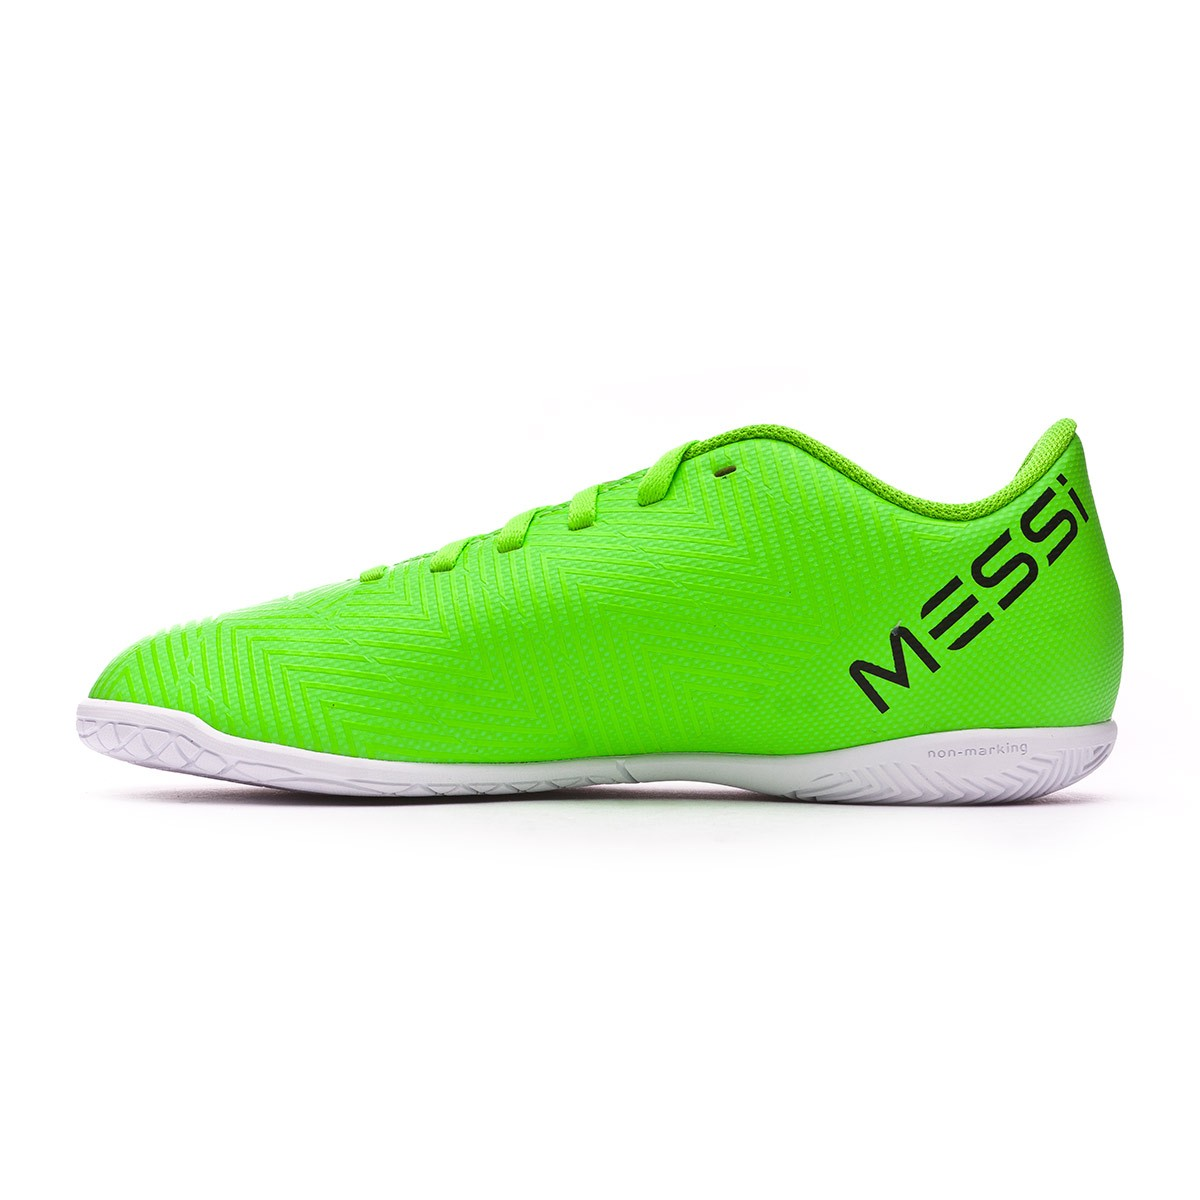 6a14fcd0a Futsal Boot adidas Kids Nemeziz Messi Tango 18.4 IN Solar green-Black -  Football store Fútbol Emotion